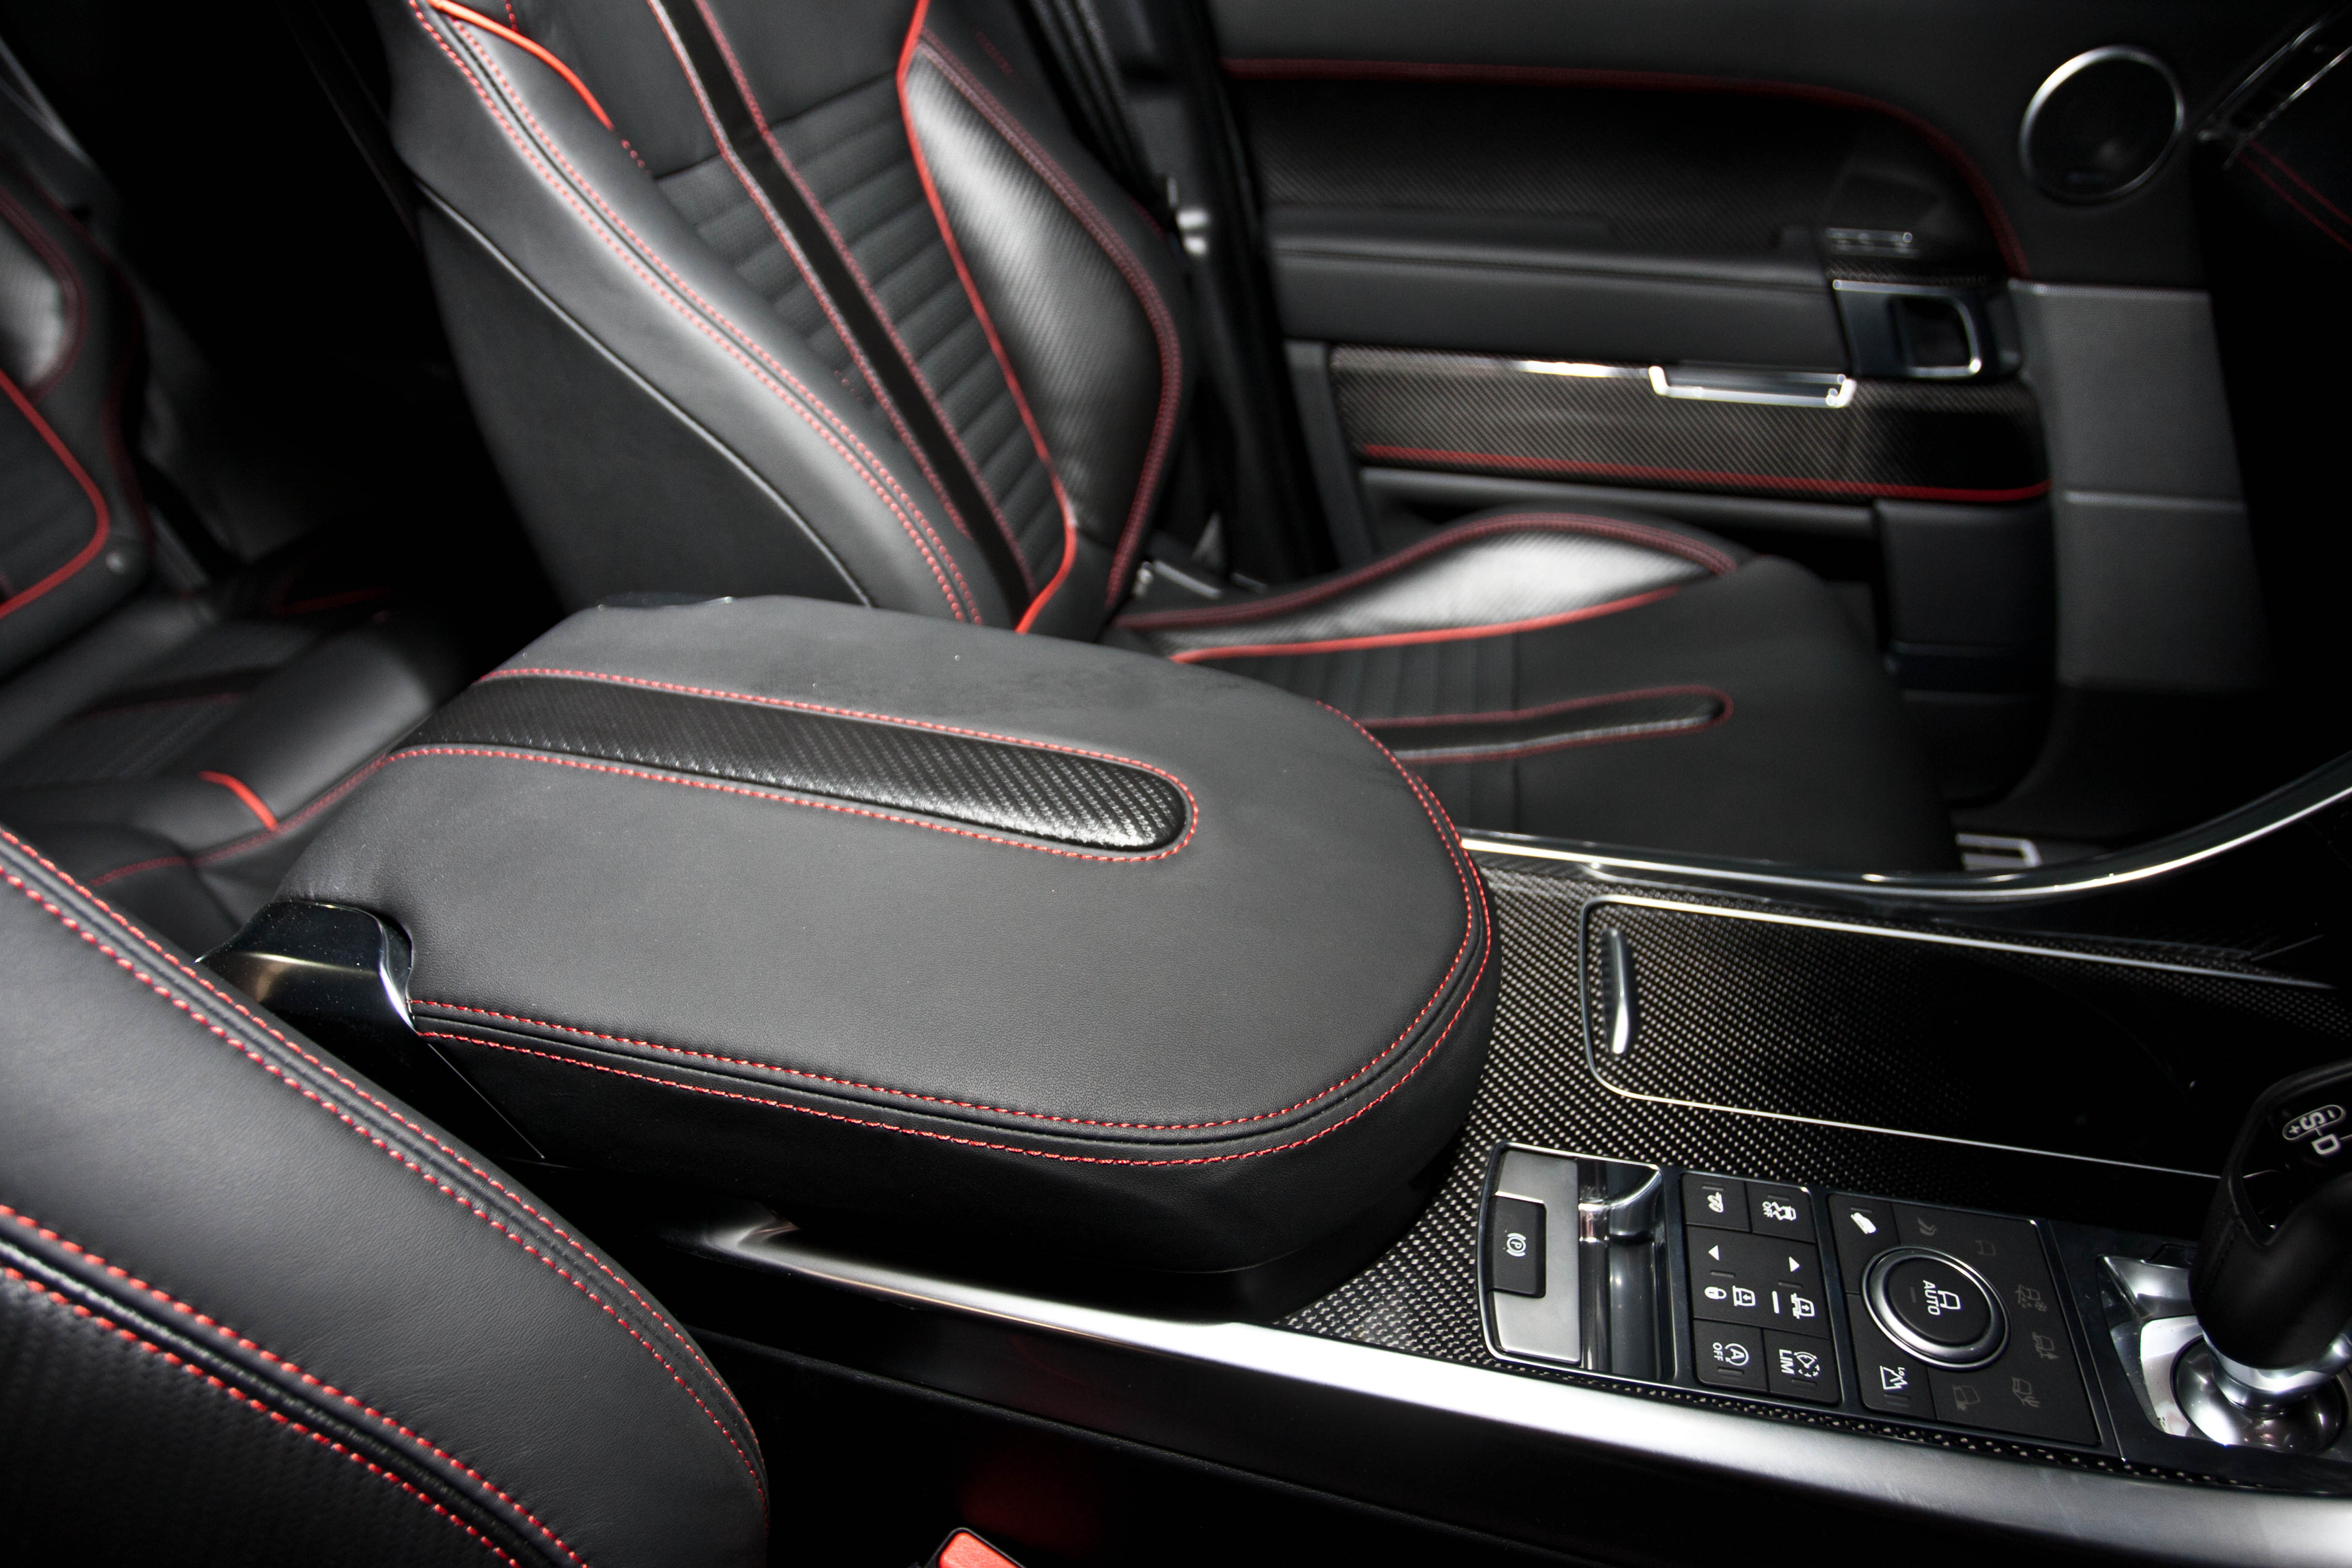 SVR Carbon Bespoke Leather Interior18